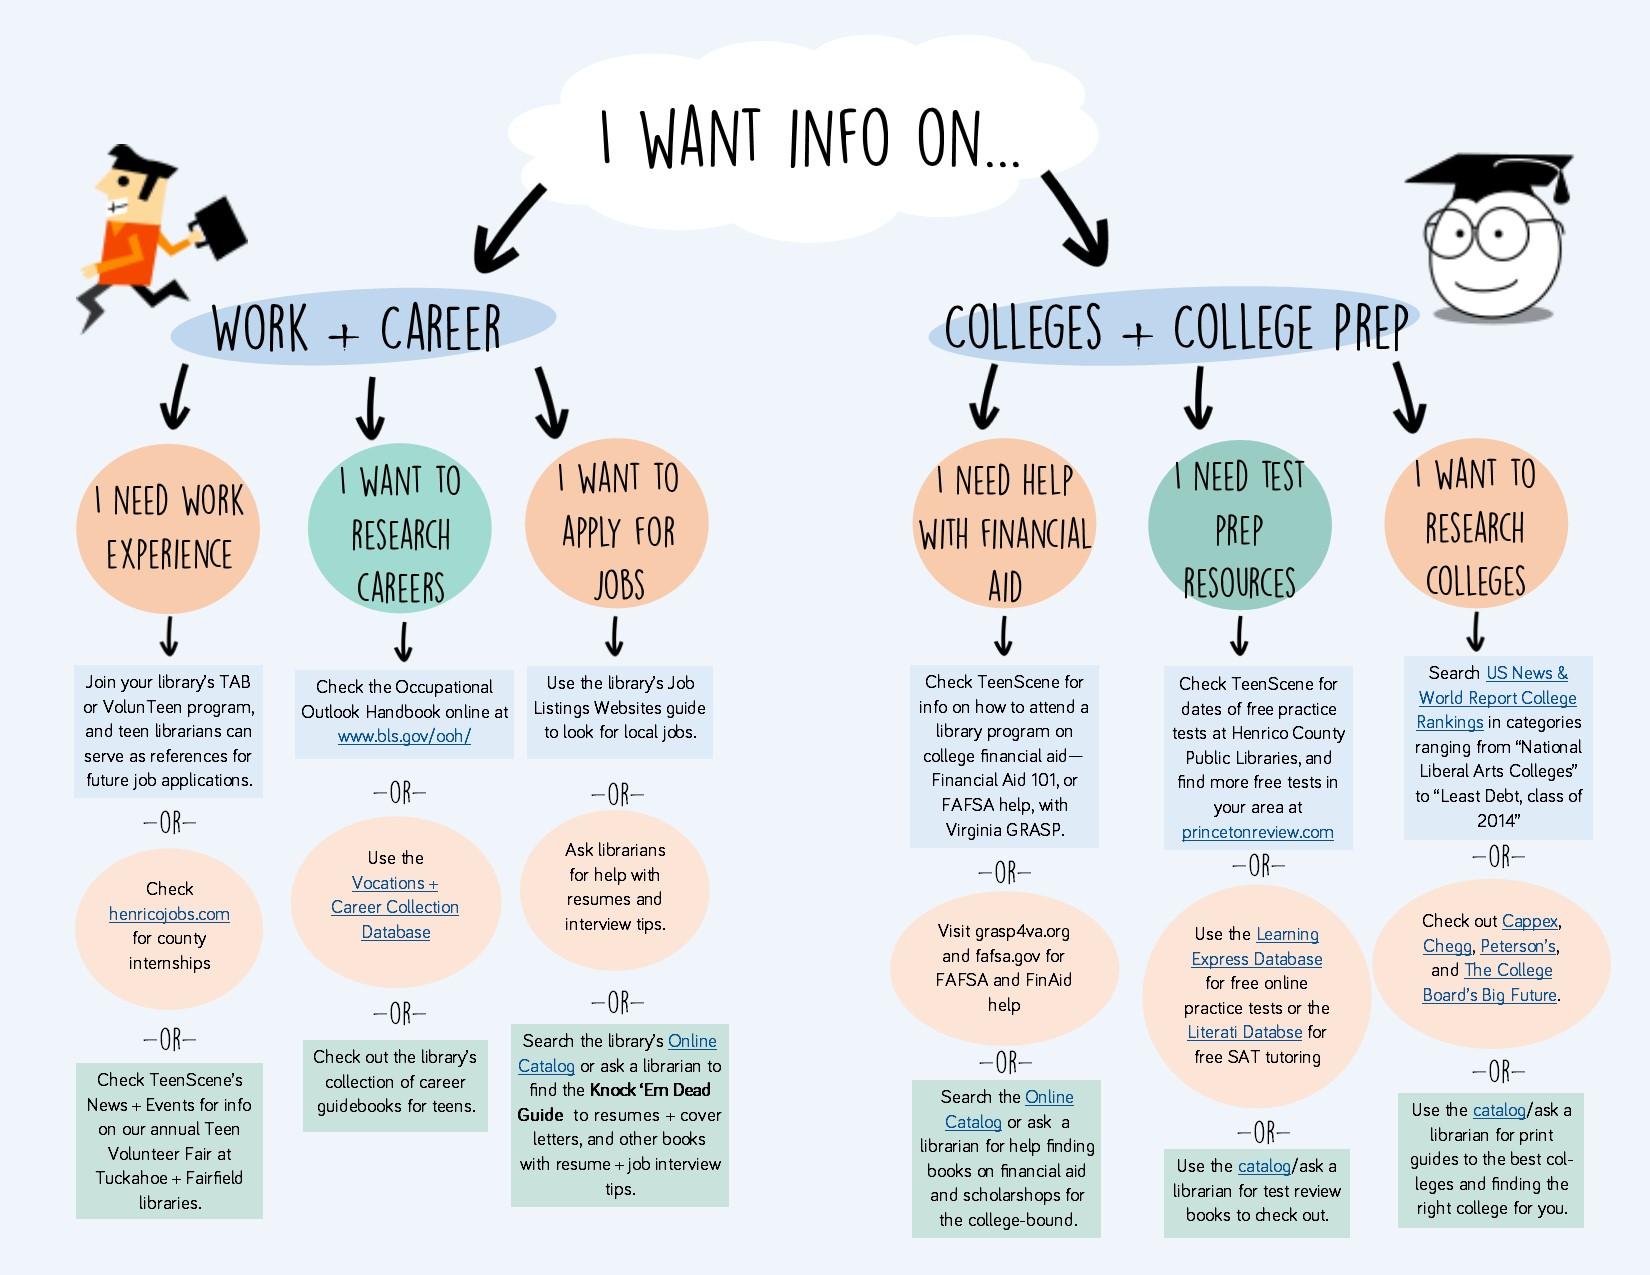 College + Career Pathfinder